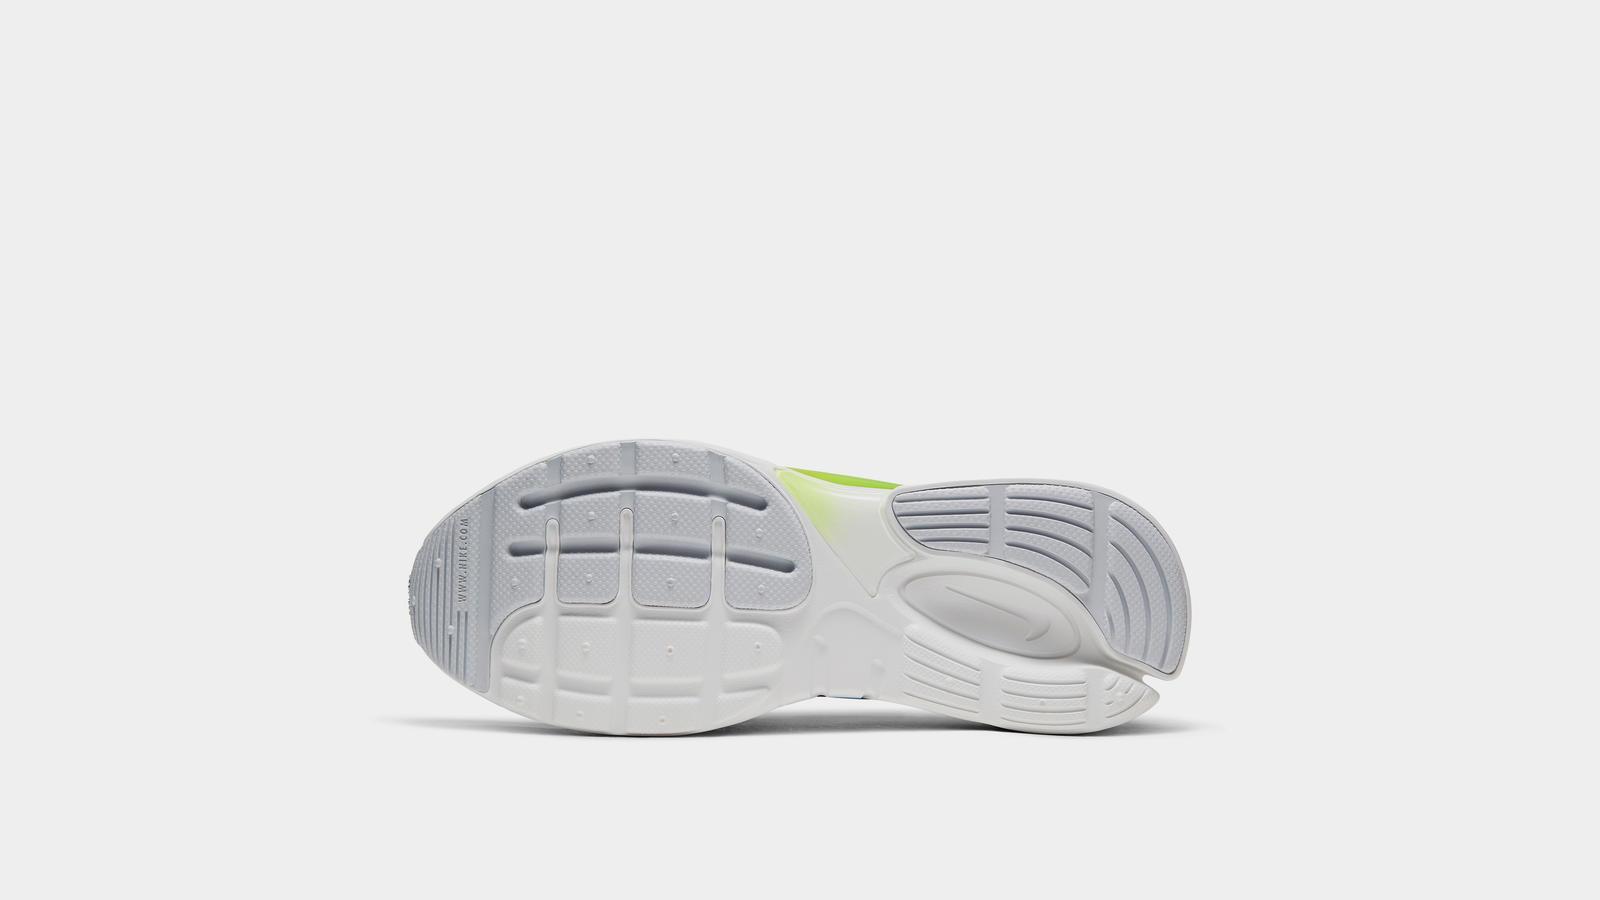 Nike Alphina 5000 10